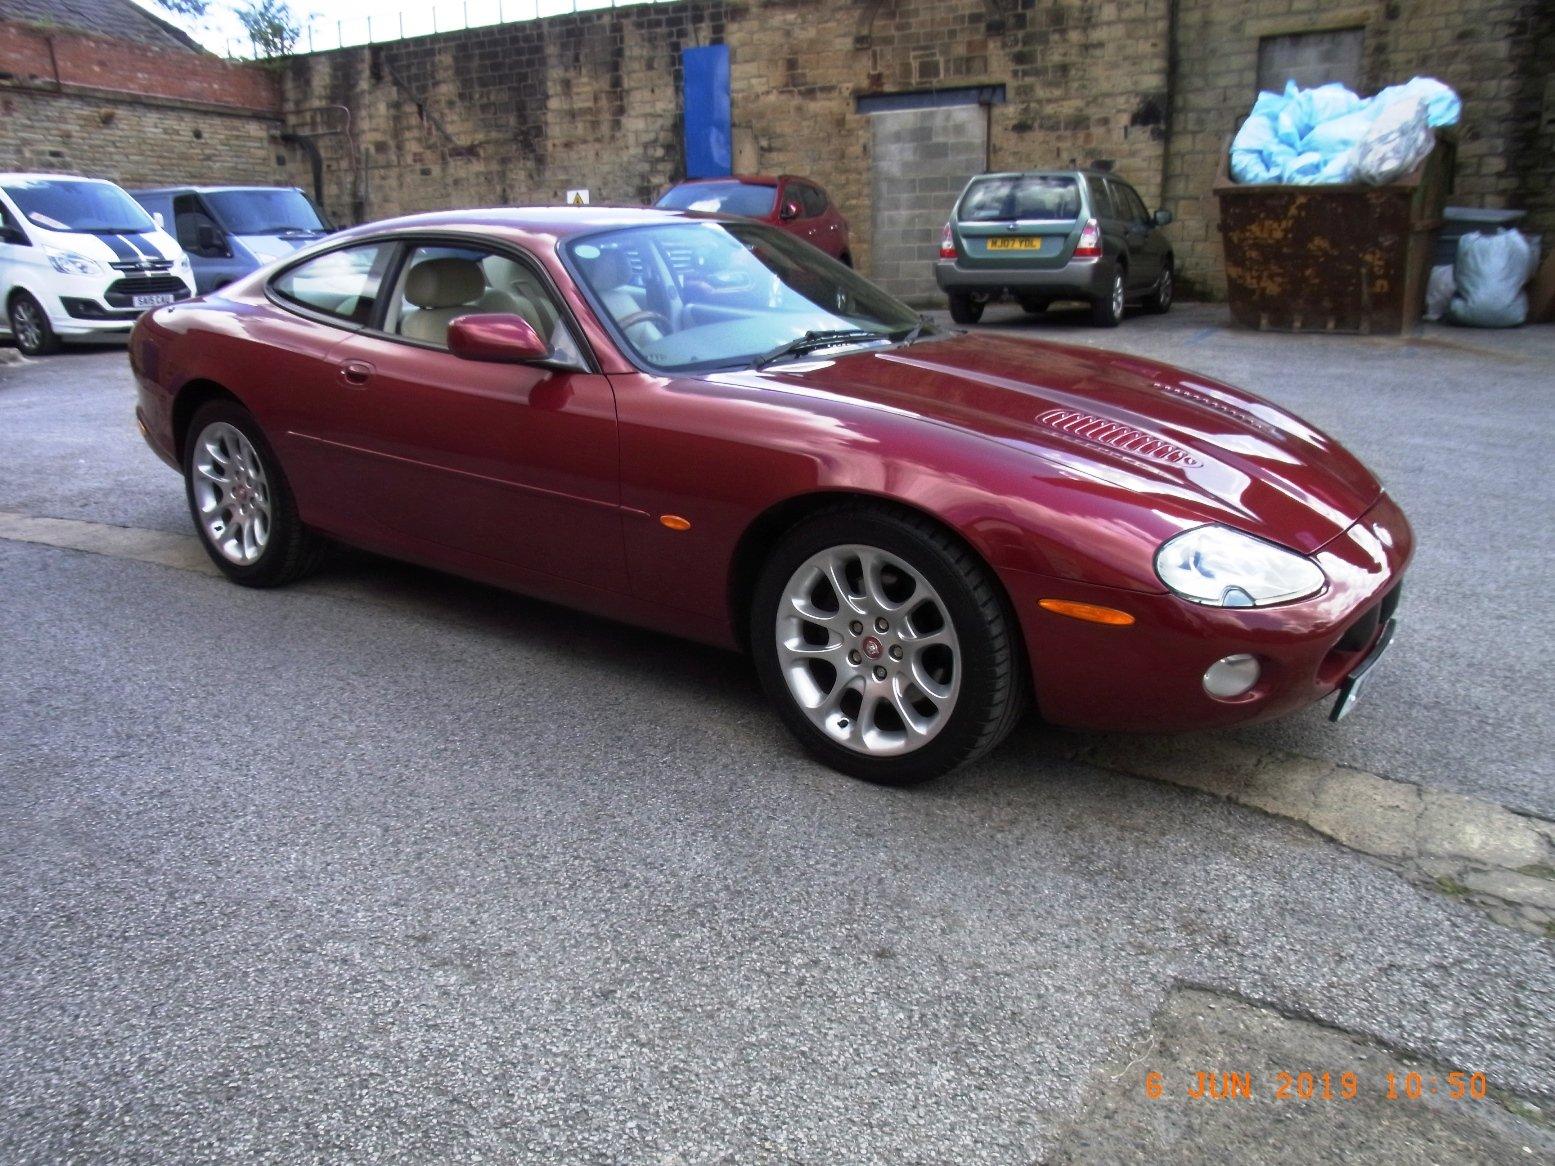 2002 Jaguar XKR 4.00 Litre Coupe For Sale (picture 2 of 6)